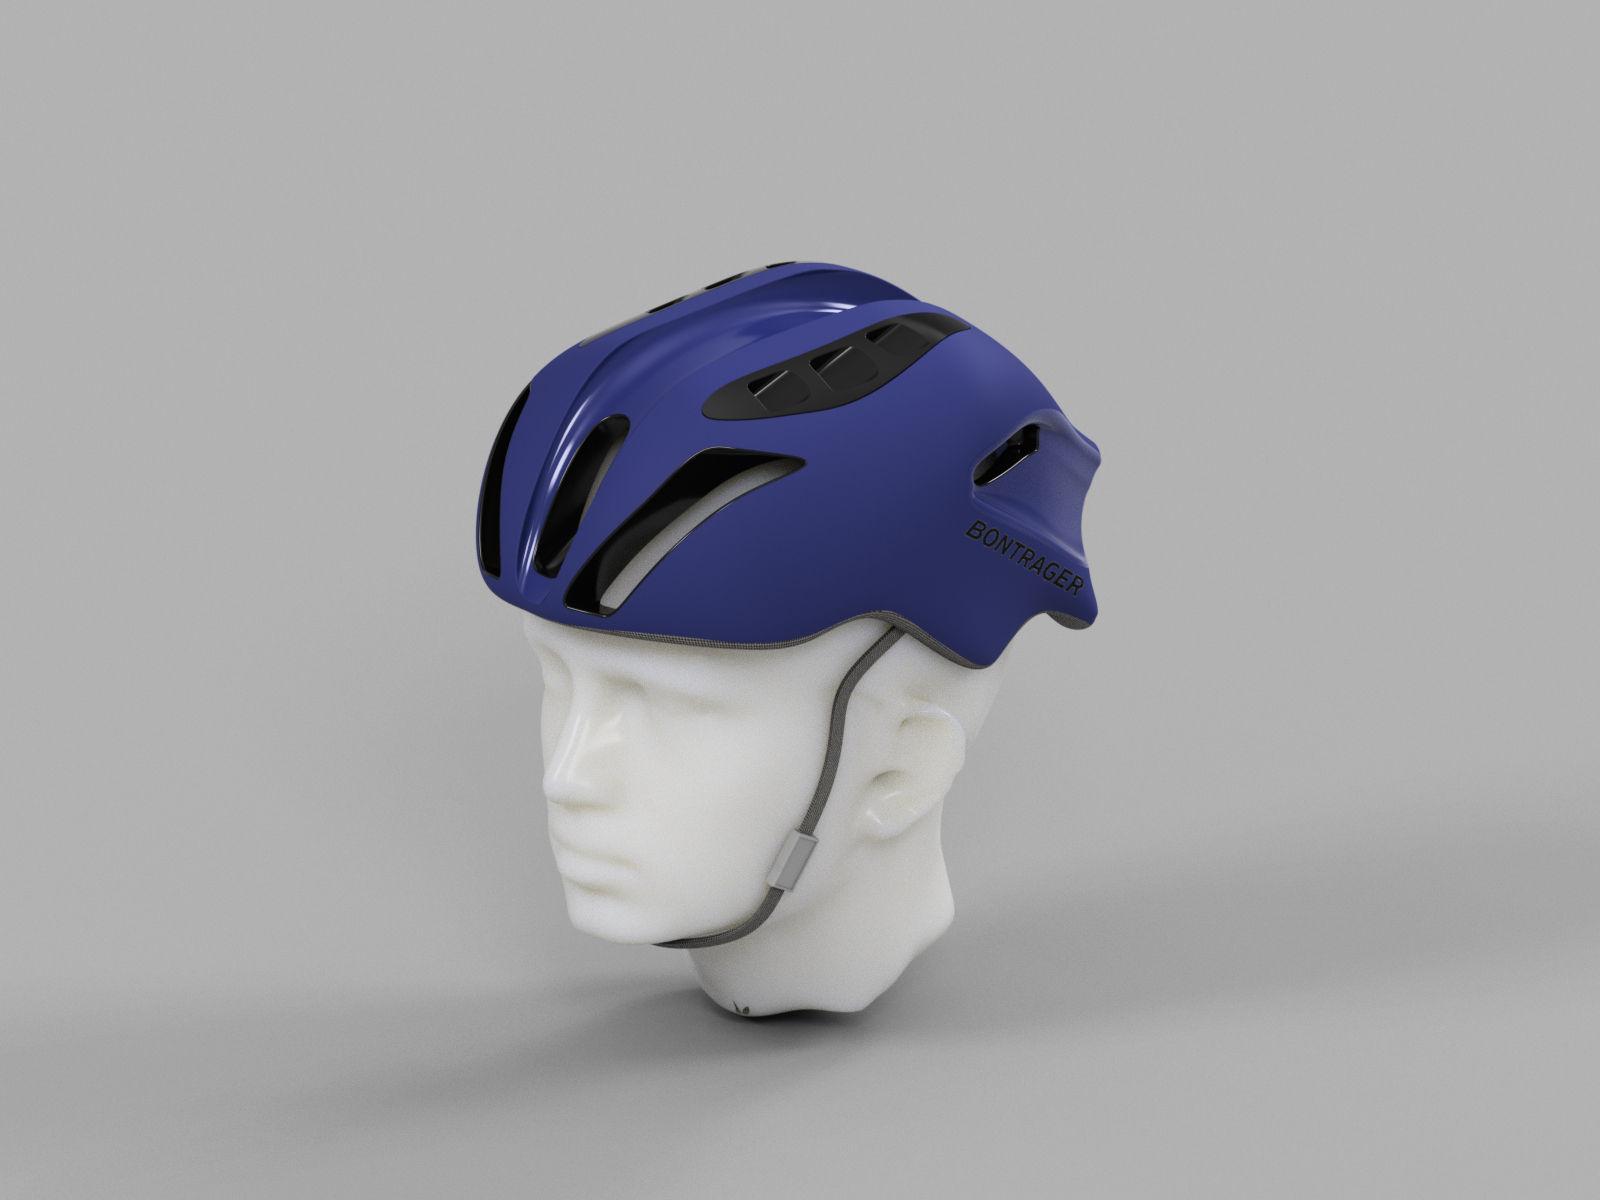 3D scanning head and sculpting bike helmet|Autodesk Online Gallery